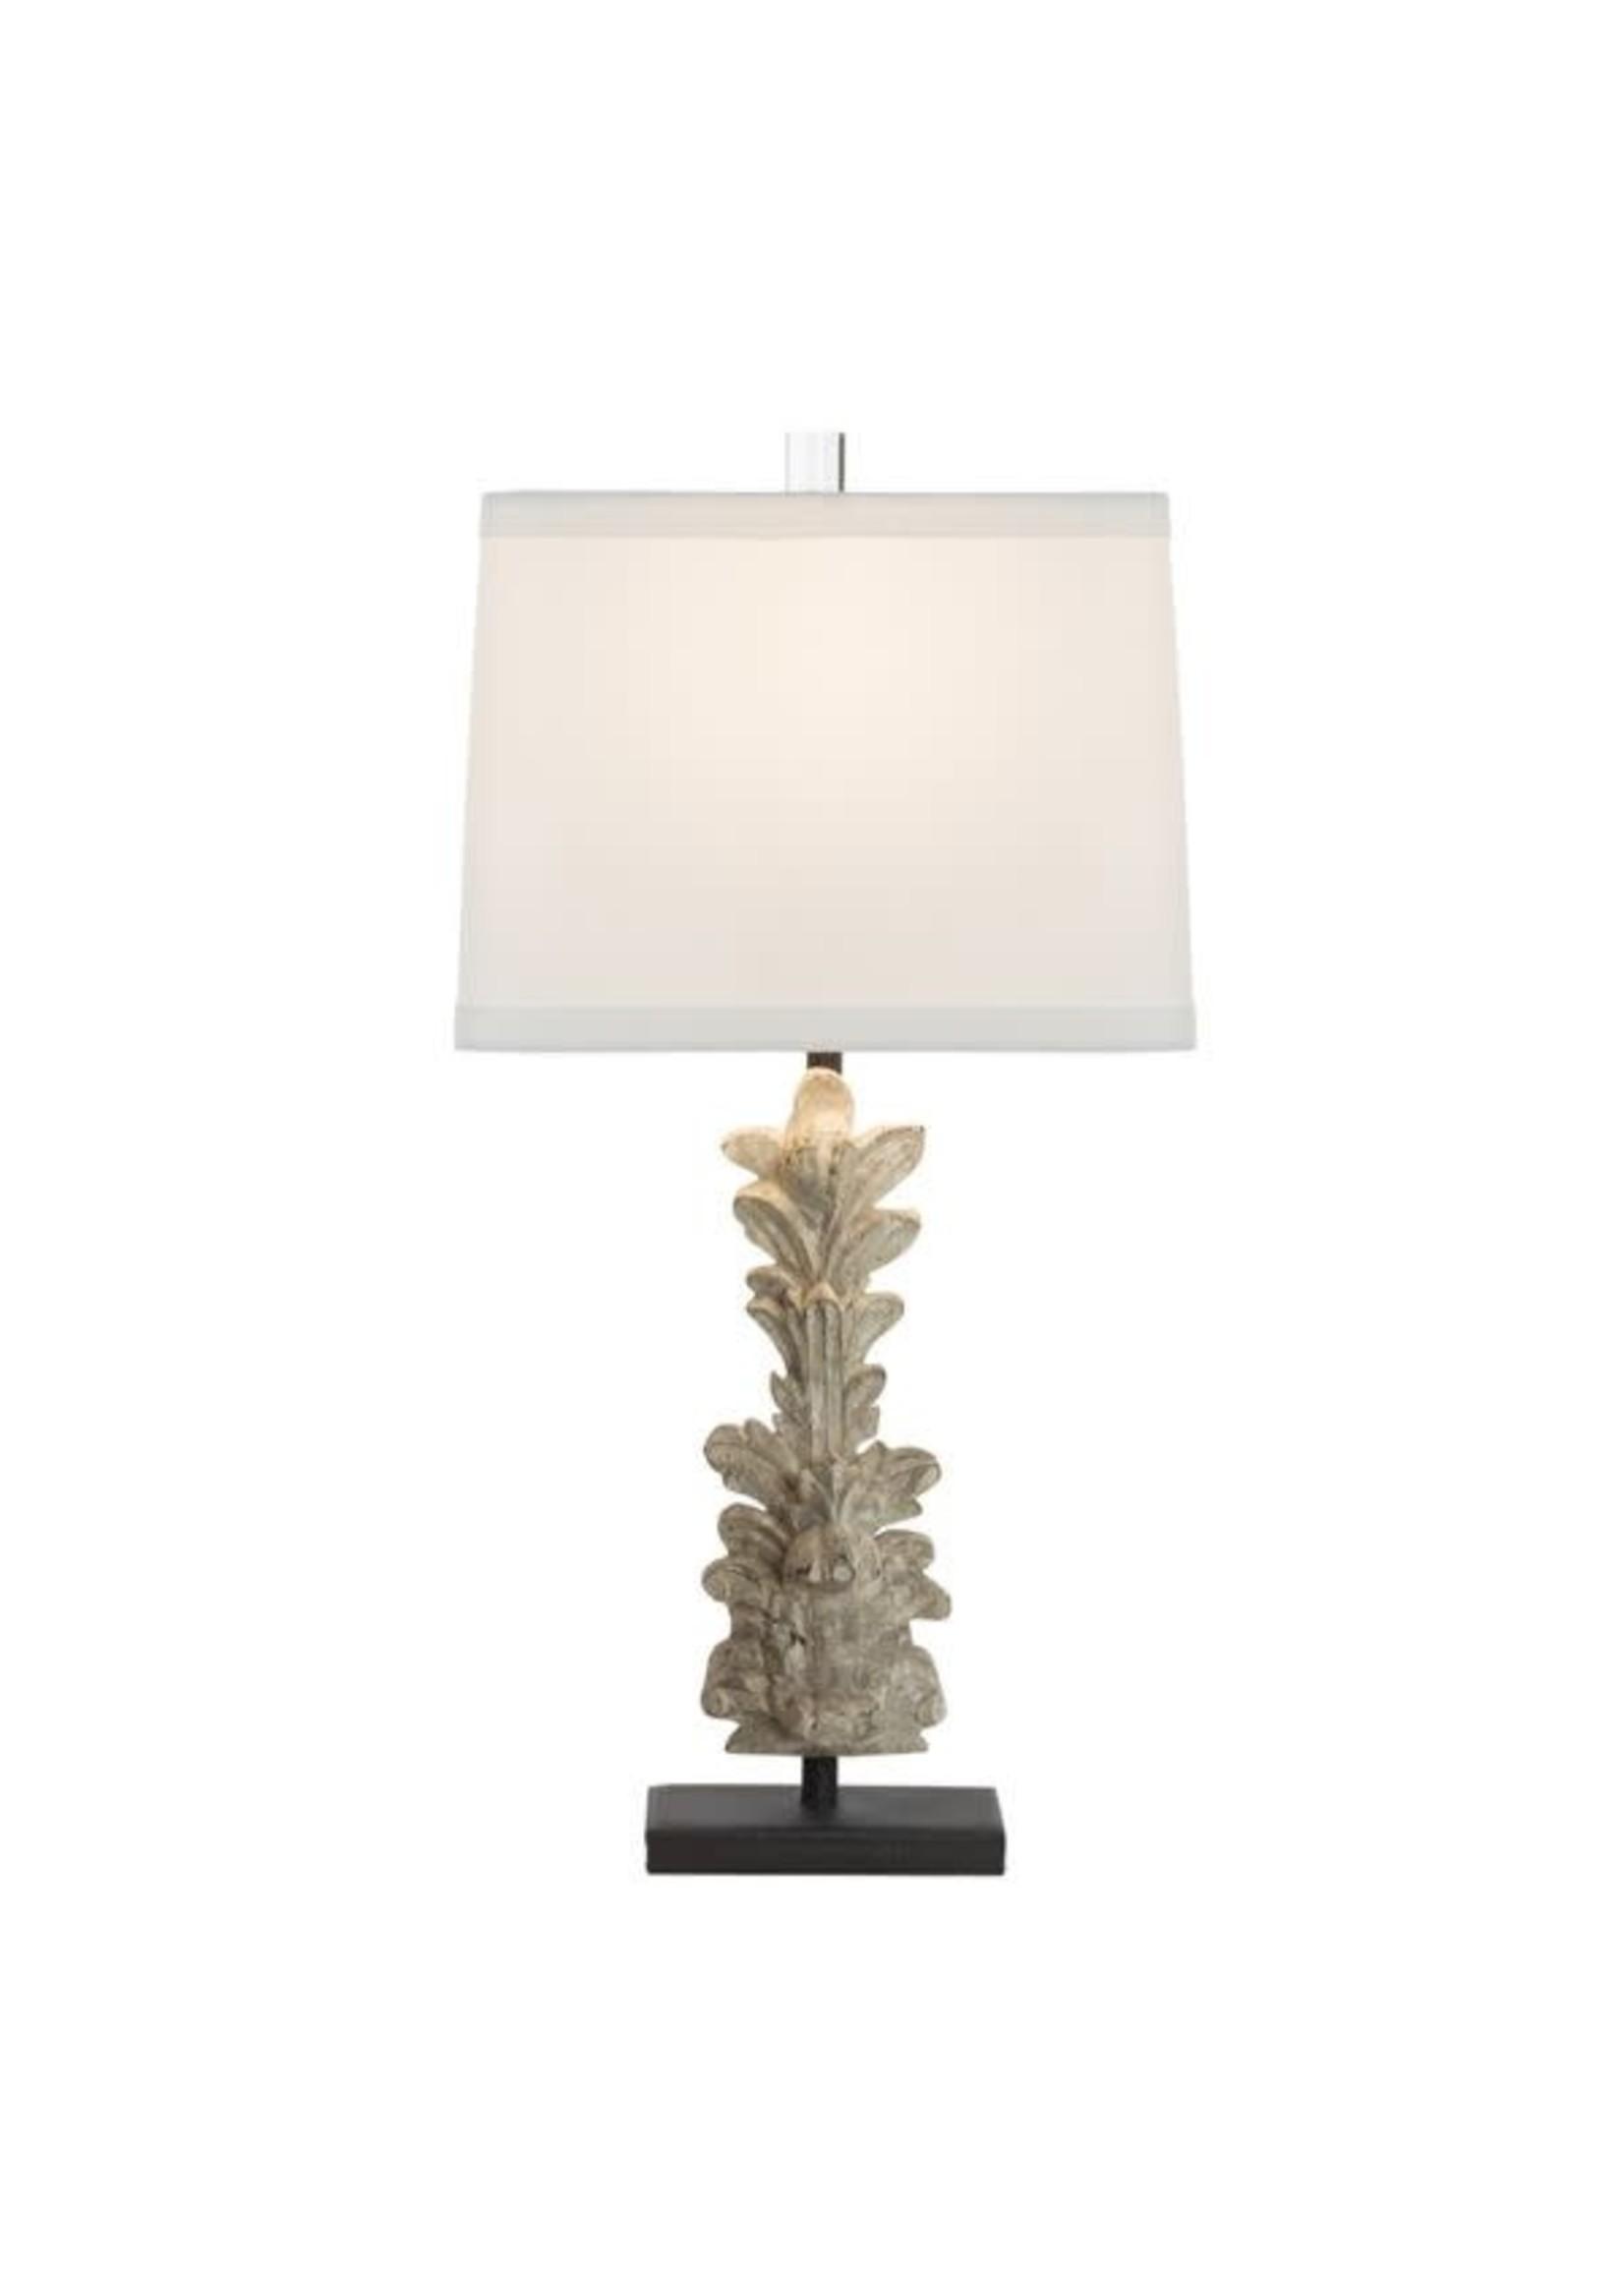 Aidan Gray Table Lamp - Hestal Carved Fragment